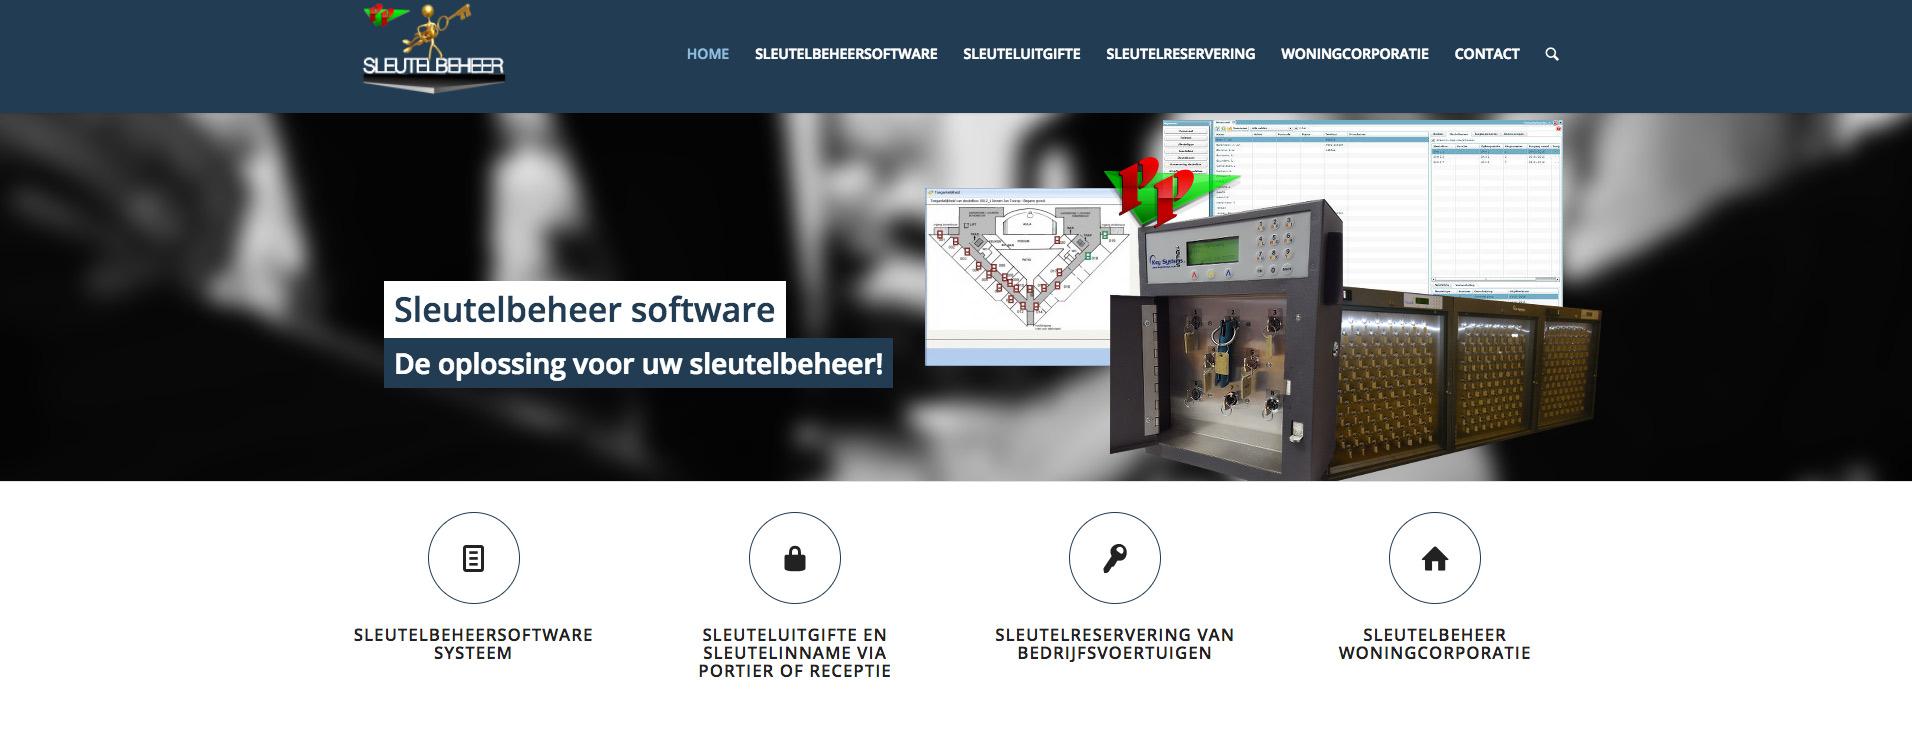 sleutelbeheersoftware.nl